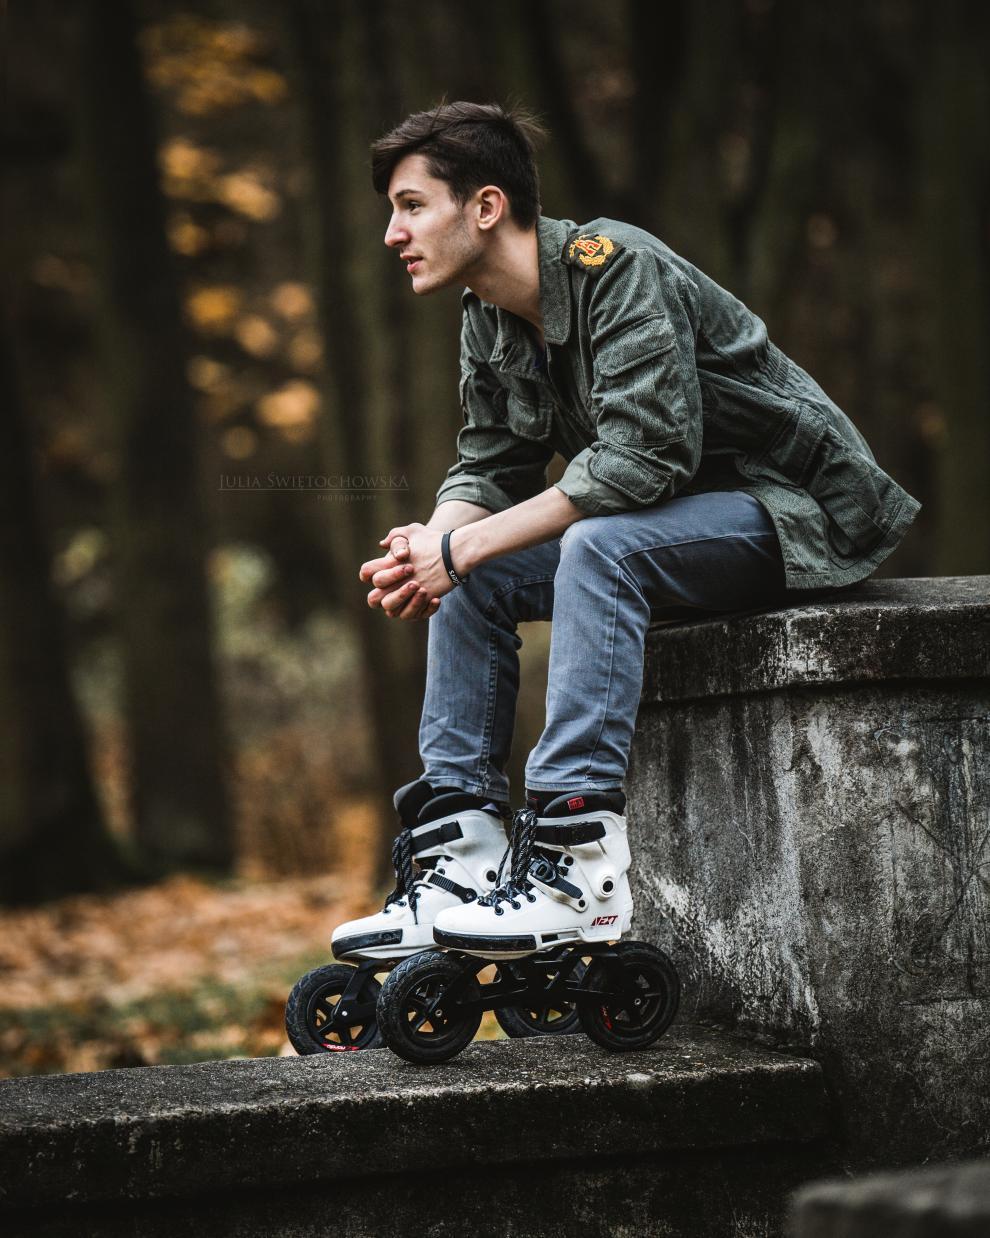 Video - Tomasz Ardzinski on Powerslide - Next skates with Edge Off-Road frame